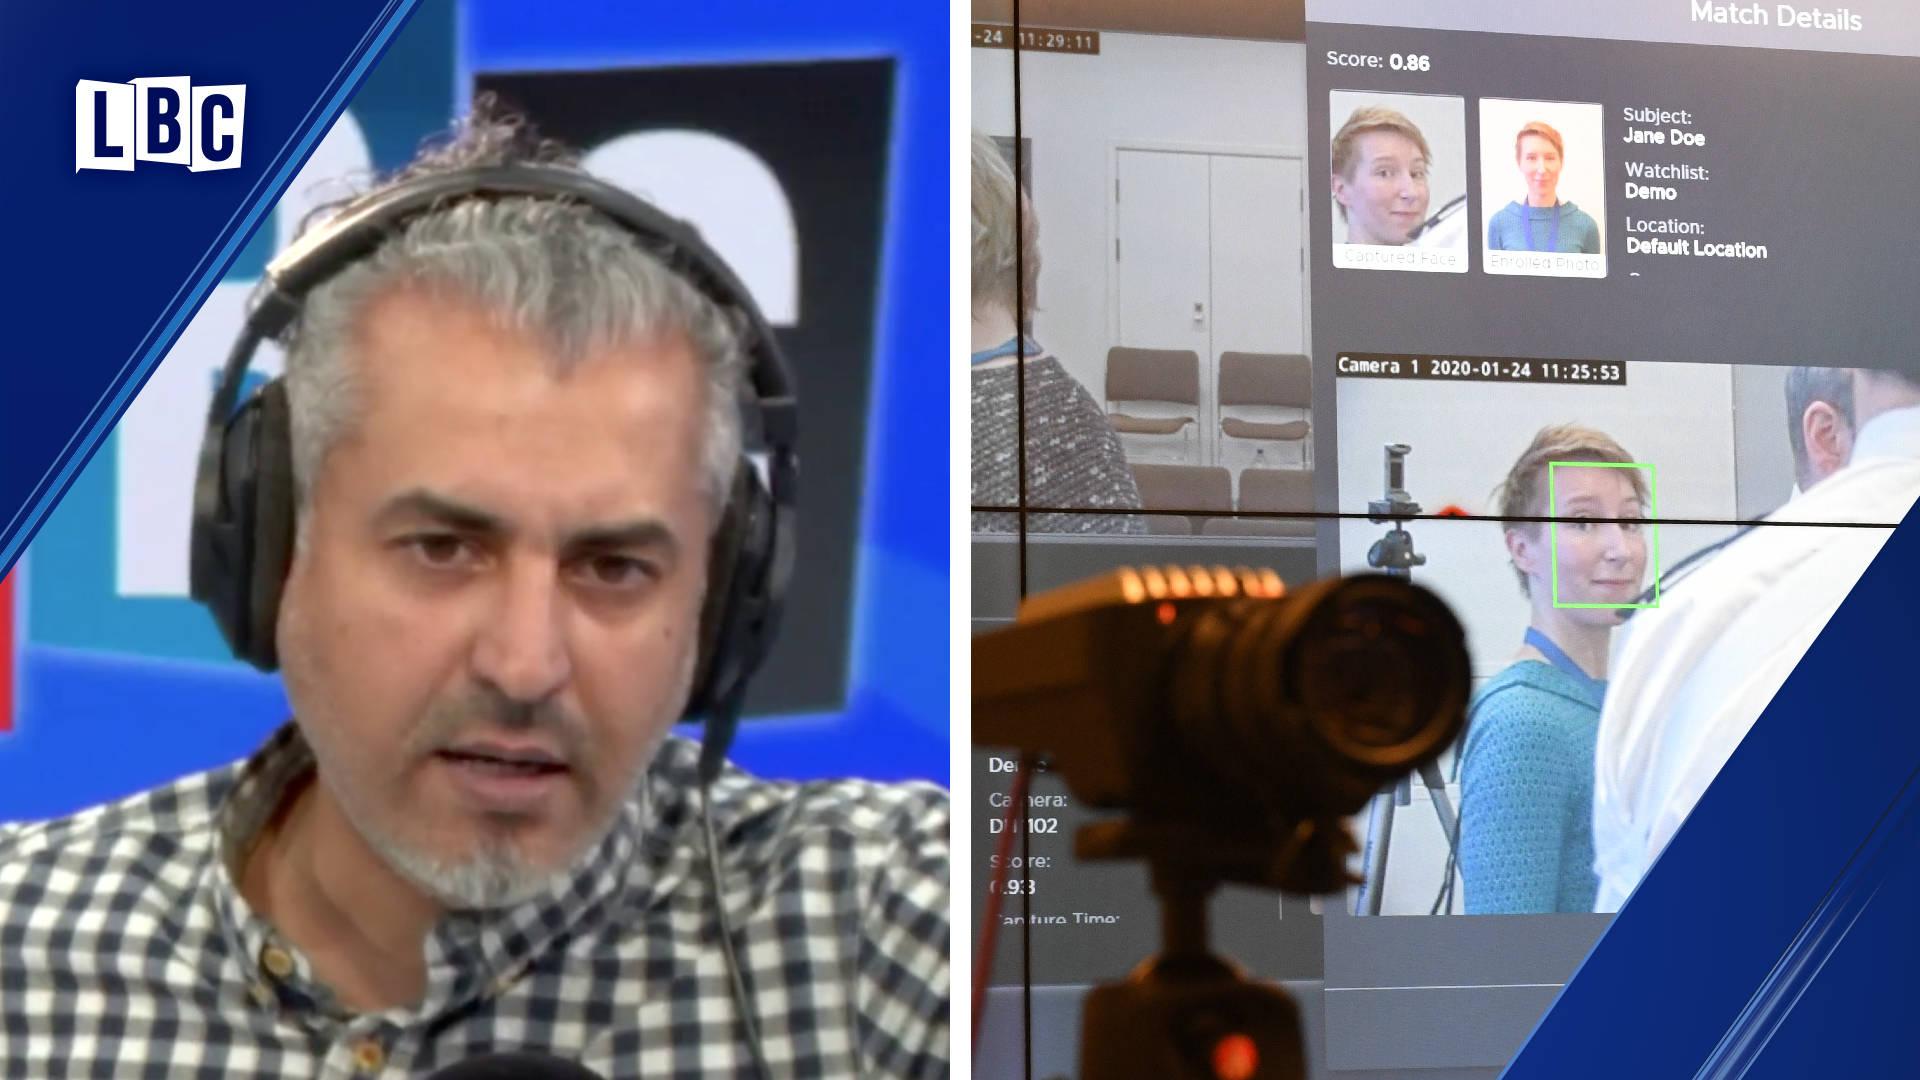 Maajid Nawaz's alarming monologue on the Met Police's facial recognition cameras